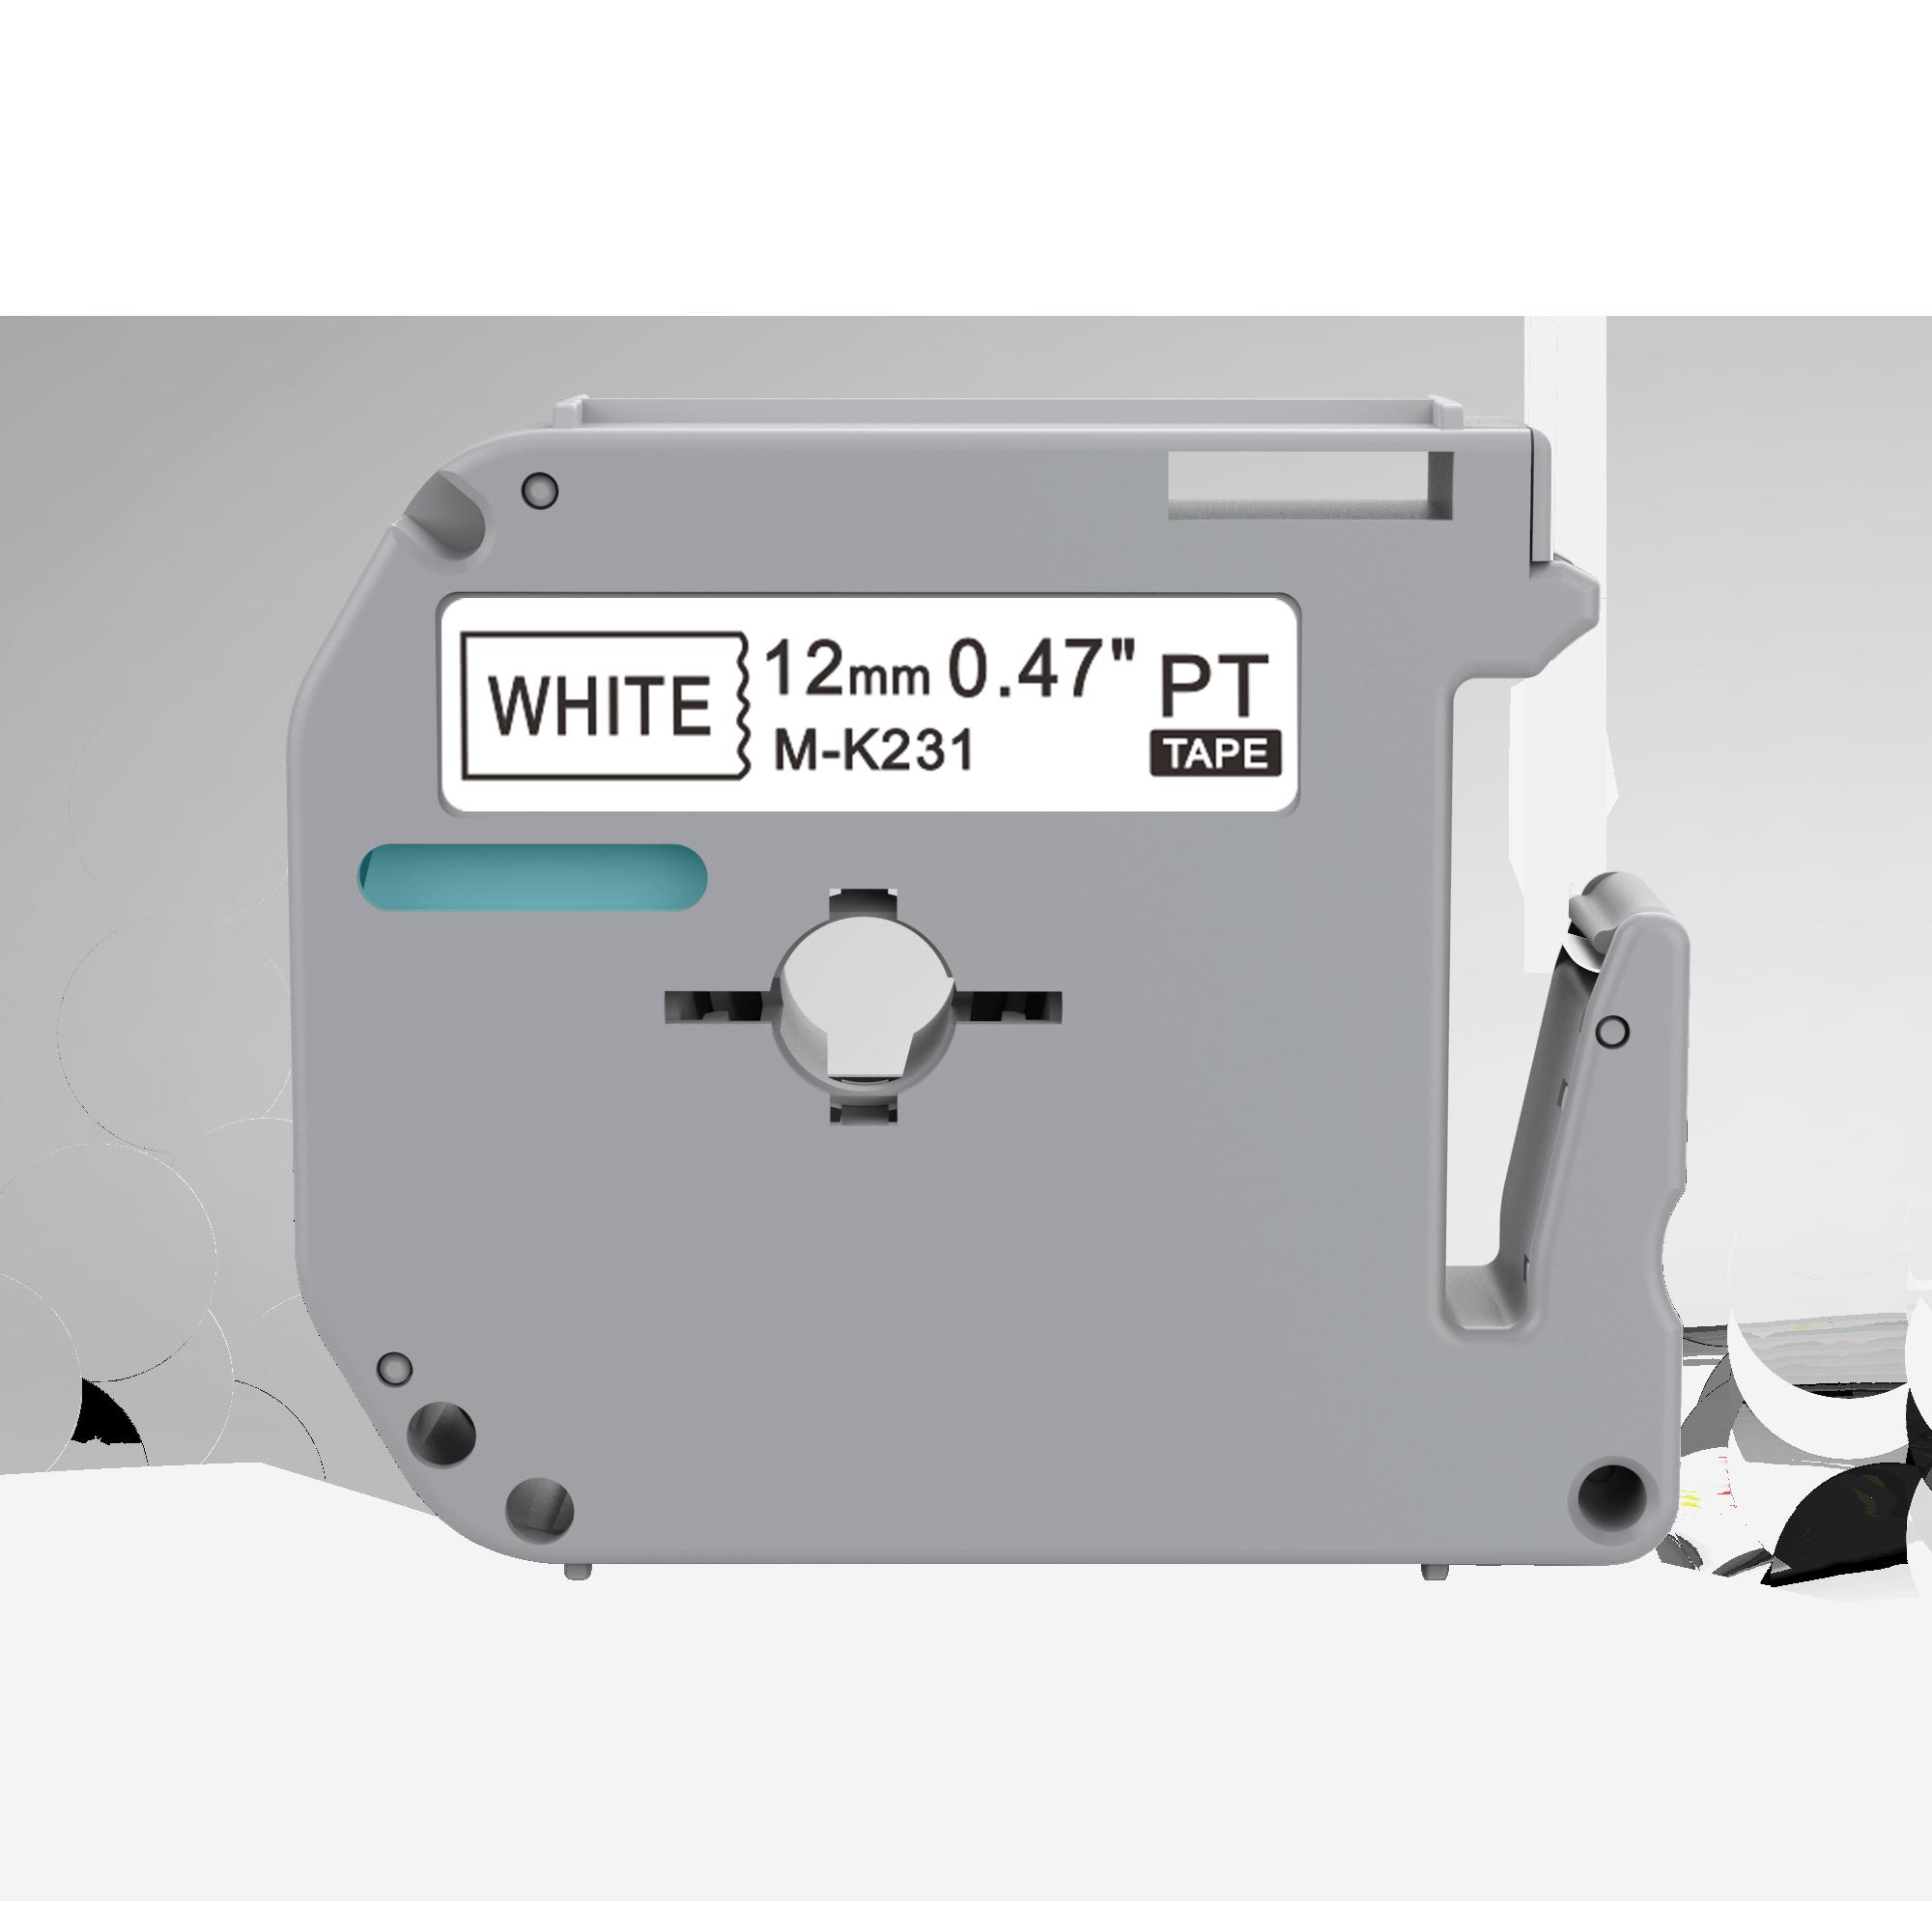 M лента mk231 клейкая этикетка лента пустые кассеты